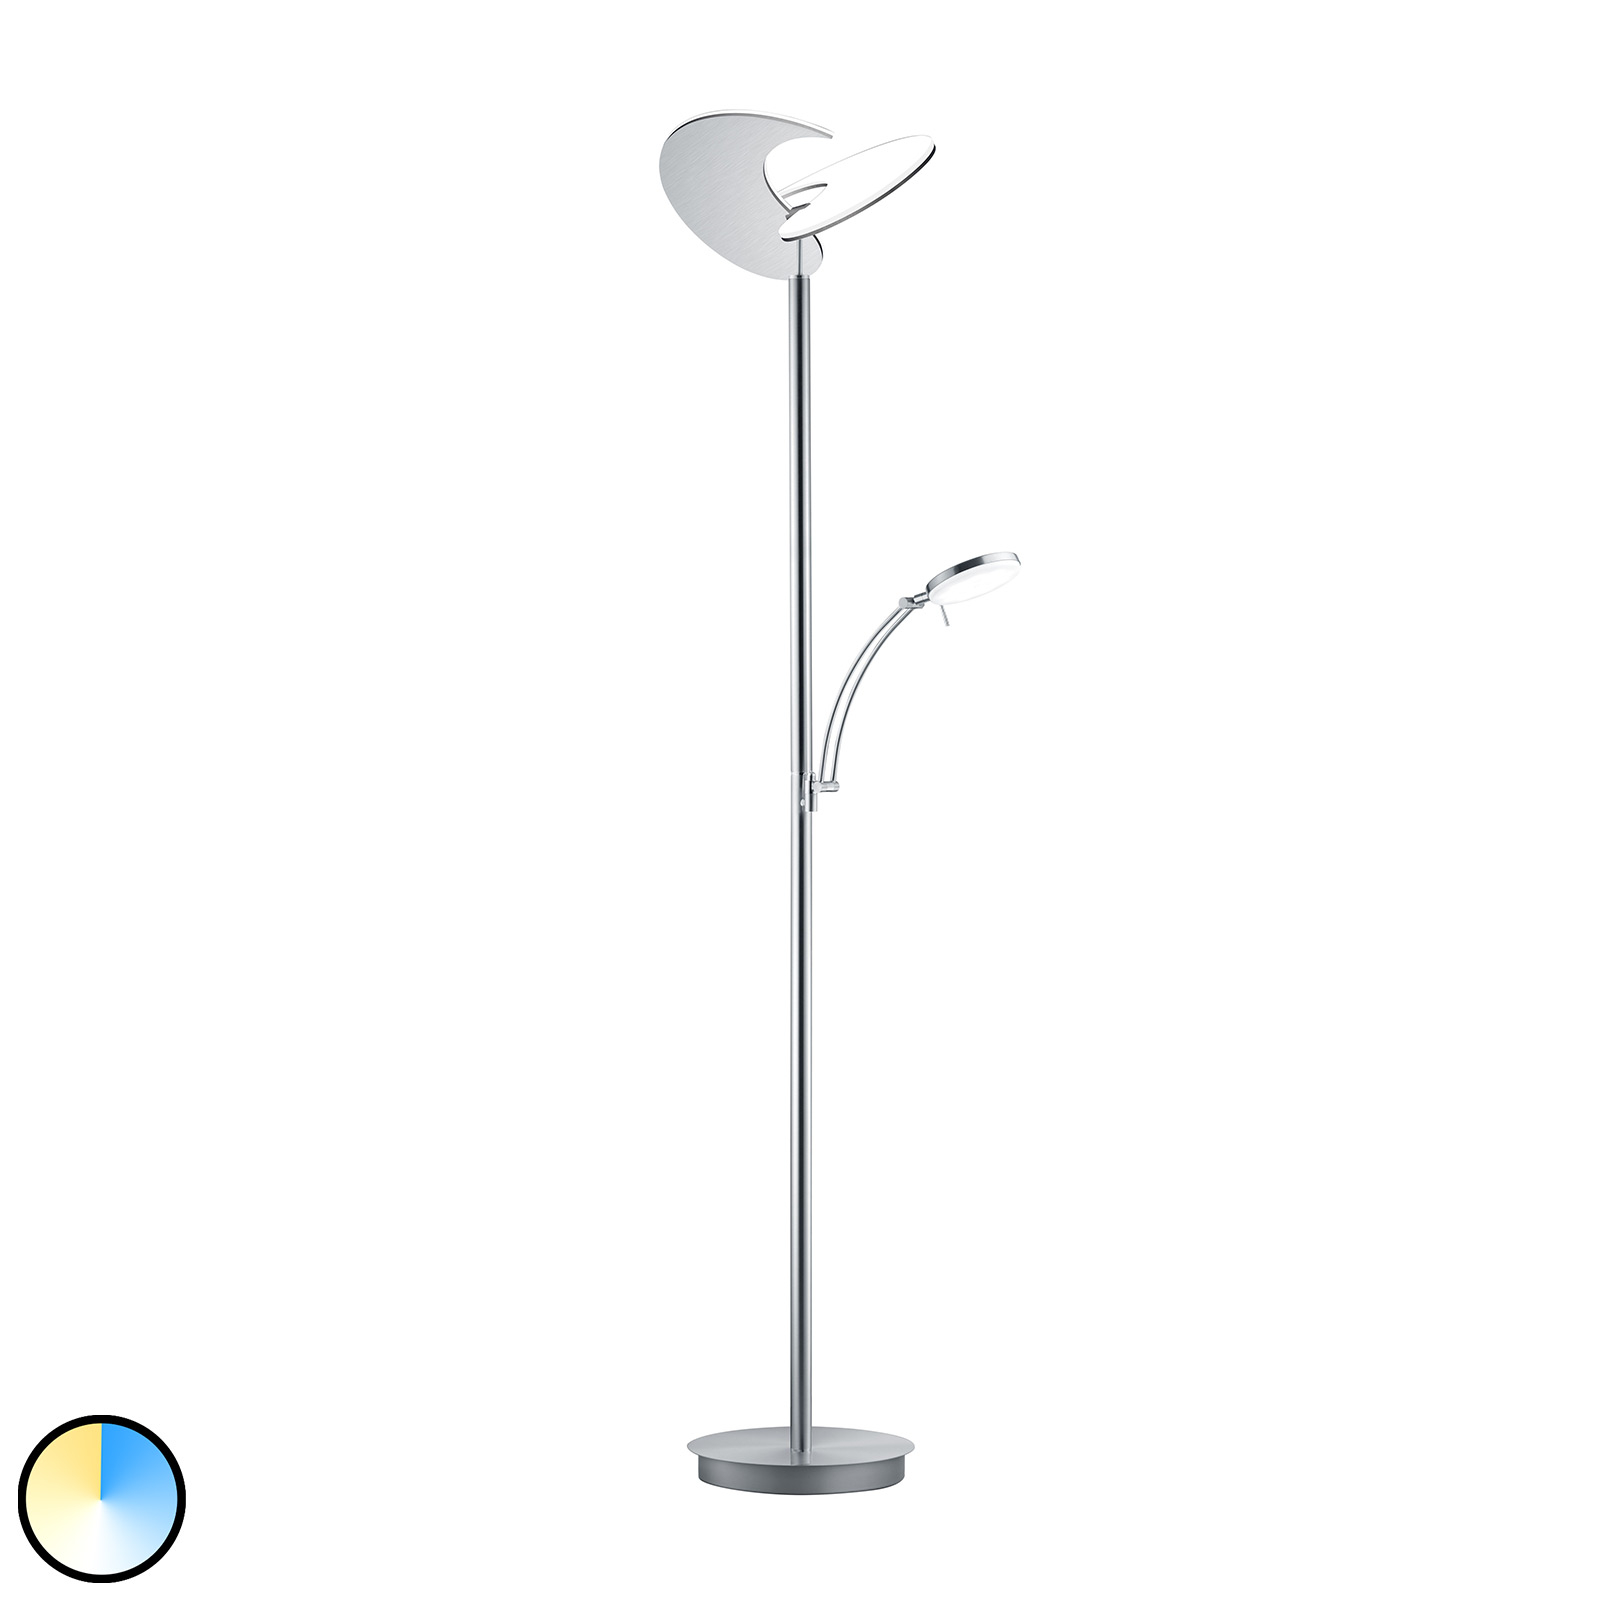 B-Leuchten Malibu LED-Stehlampe nickel matt CCT